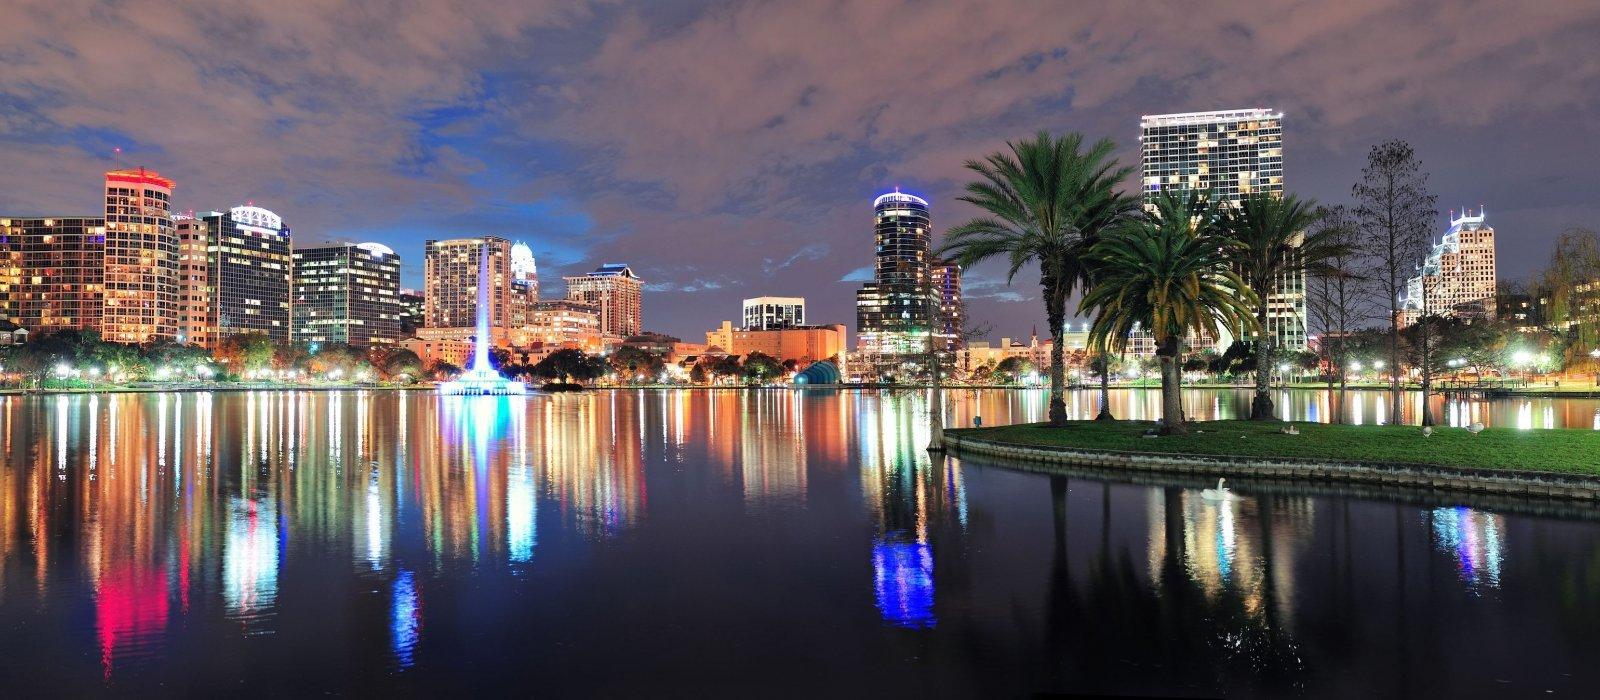 East Coast with Orlando and Bahamas